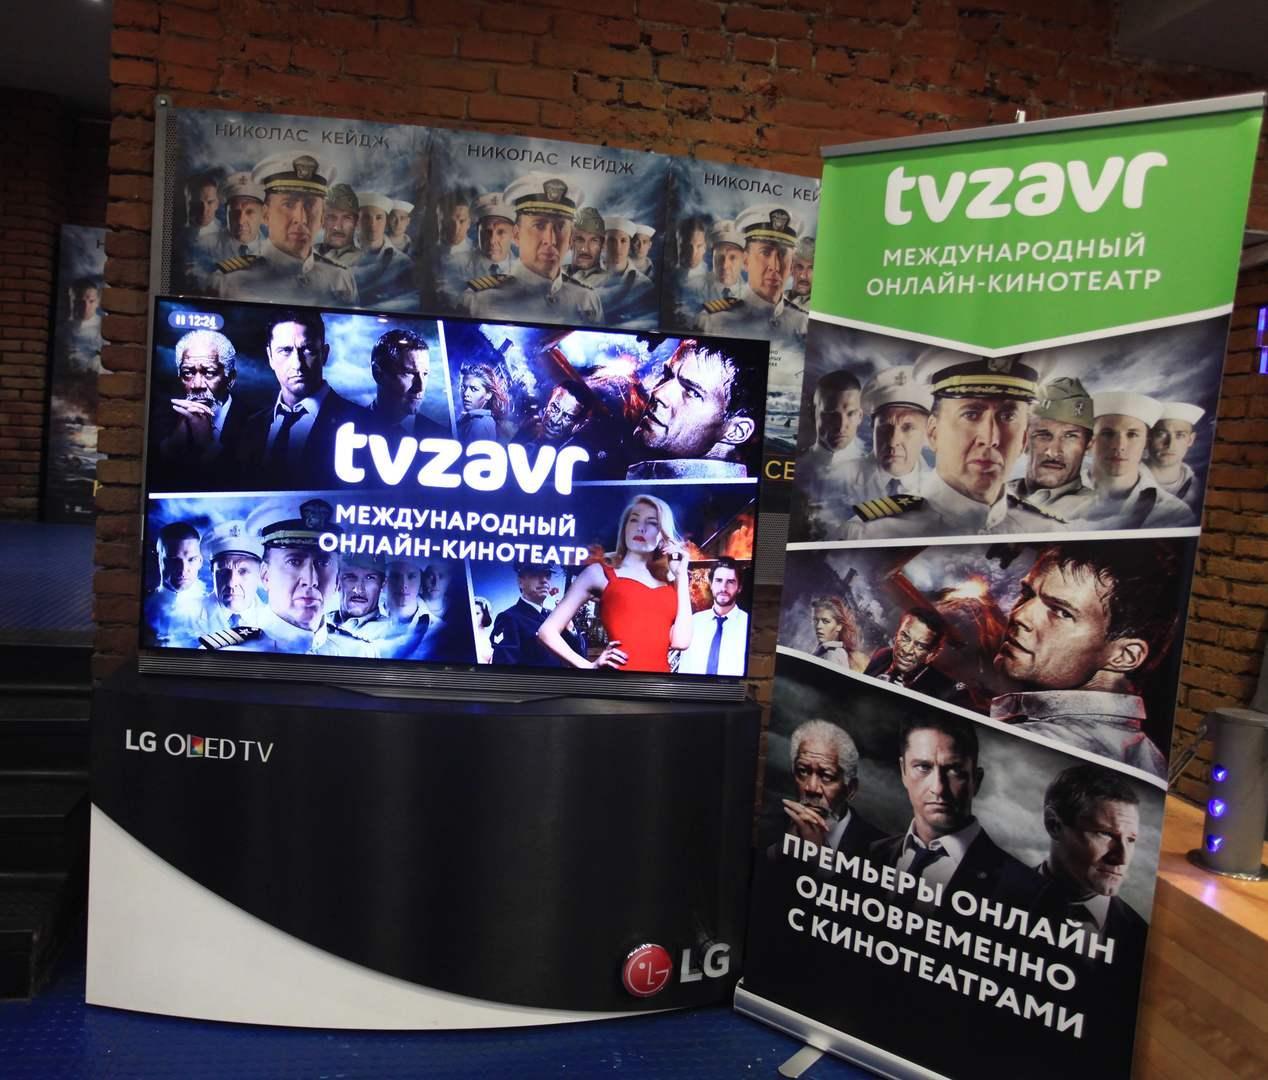 Tvzavr оказался под угрозой банкротства из-за долгов перед своими кредиторами